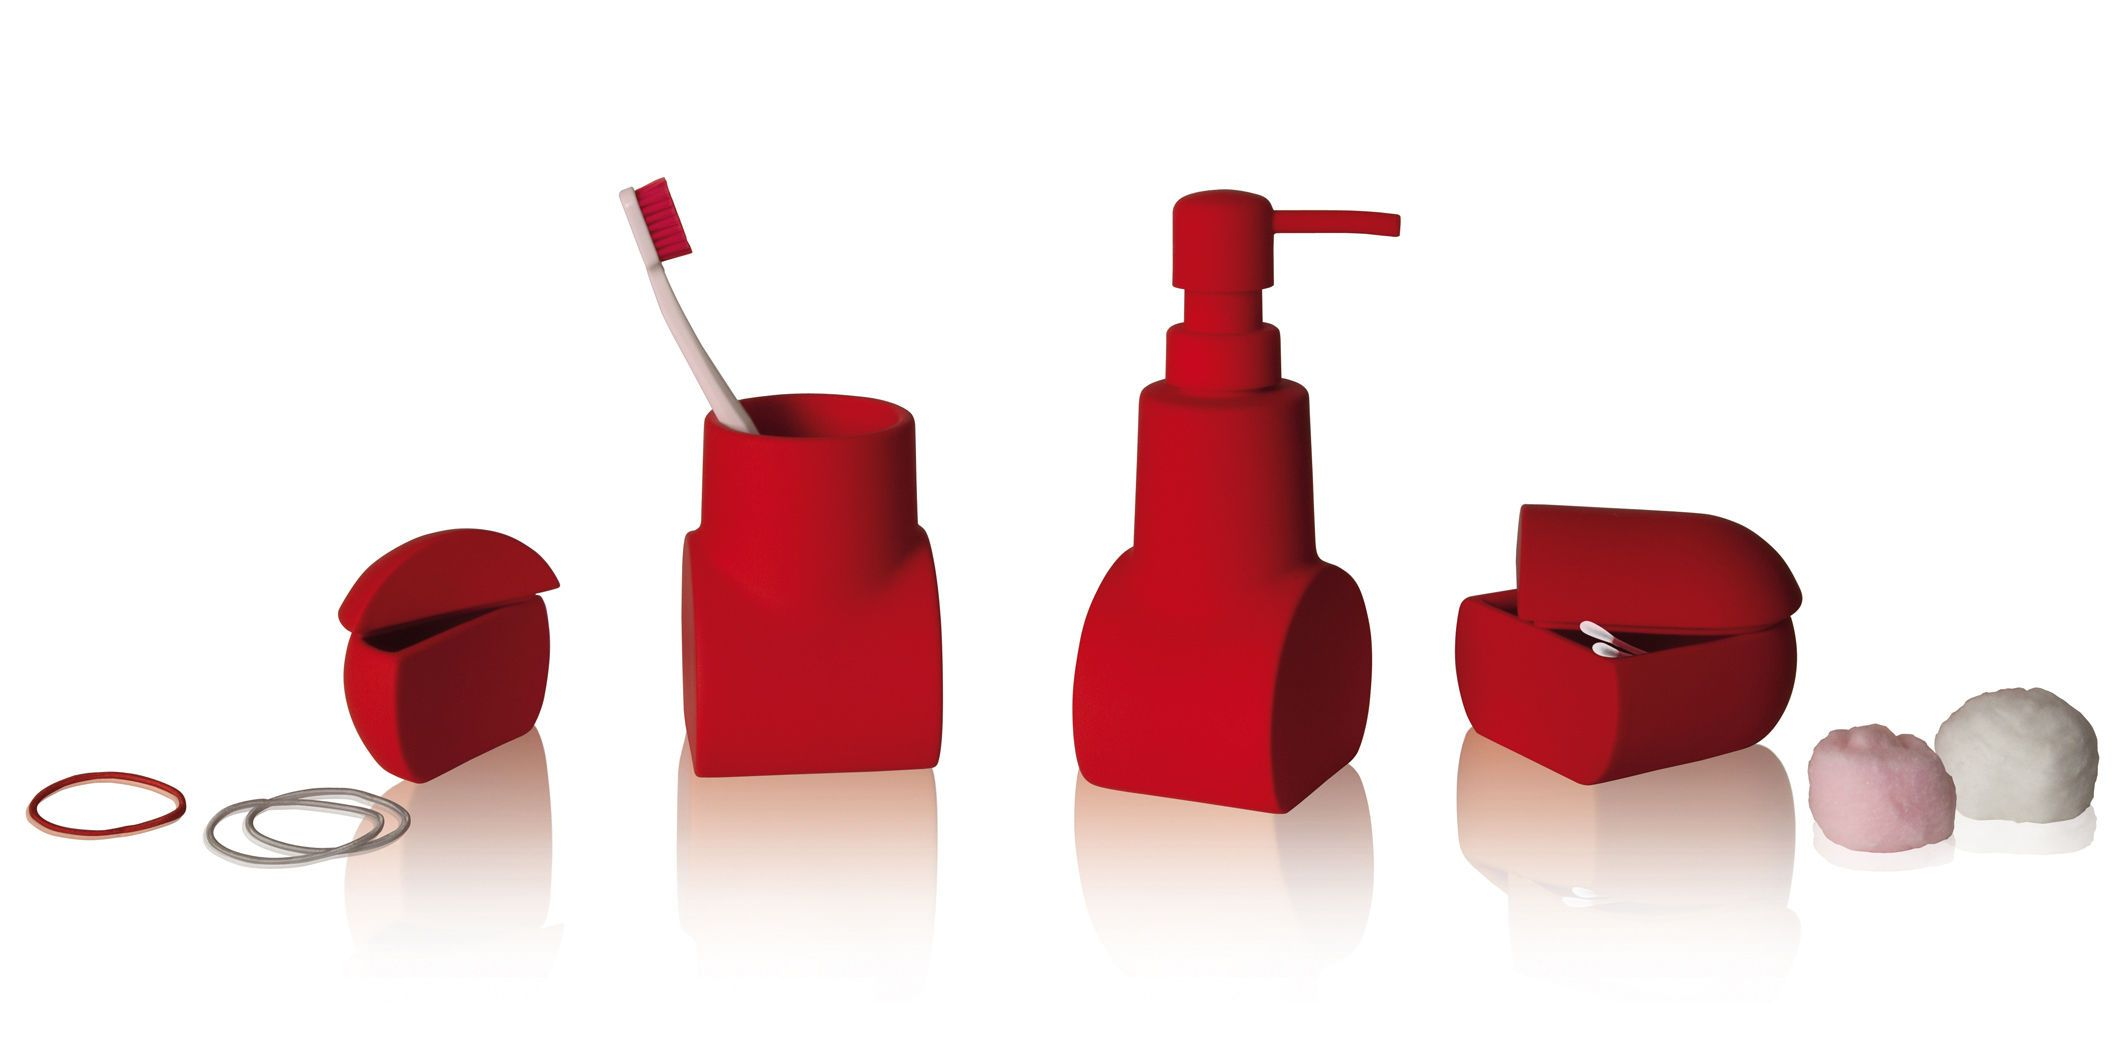 red bathroom accessories set uk | ideas 2017-2018 | Pinterest | Red ...